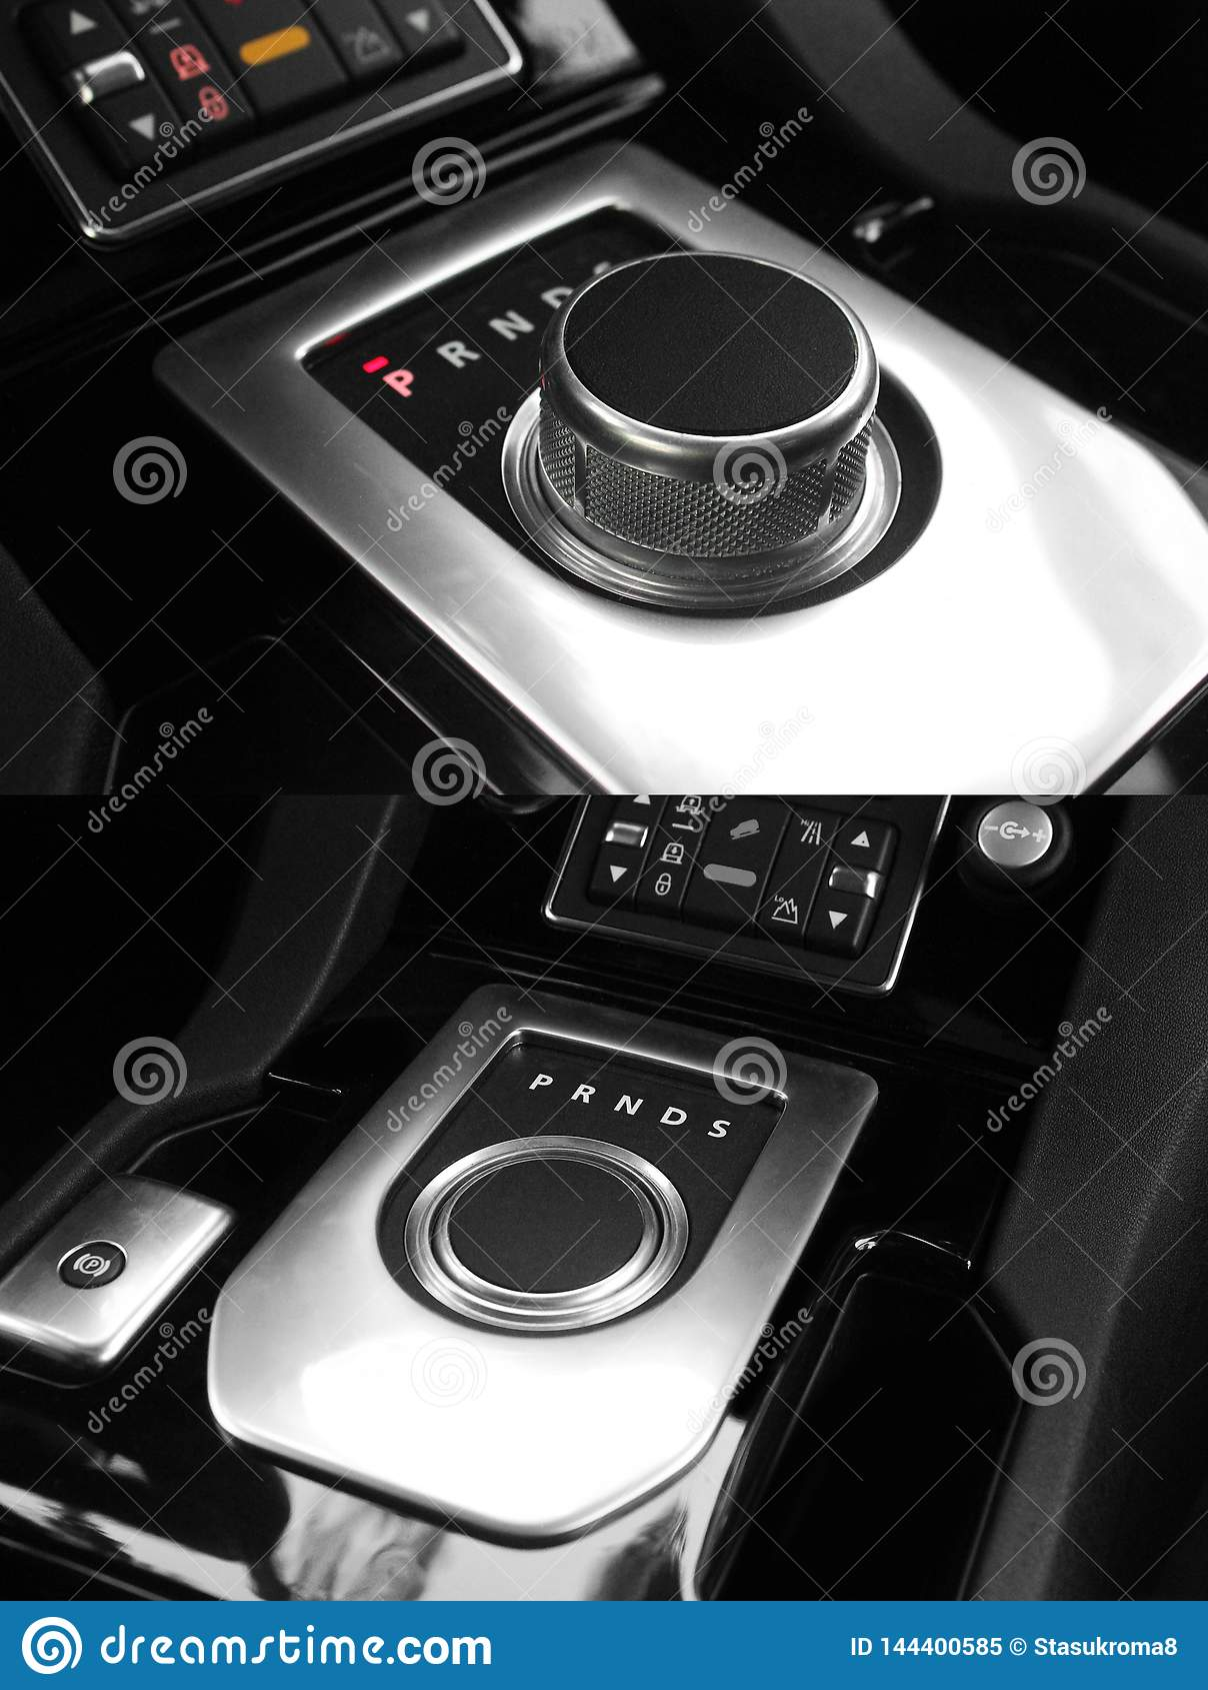 Dark luxury king Interior - Steering wheel, Shift Lever. Tuning. Karbon. Europe. Modern car automatic transmission. Interior